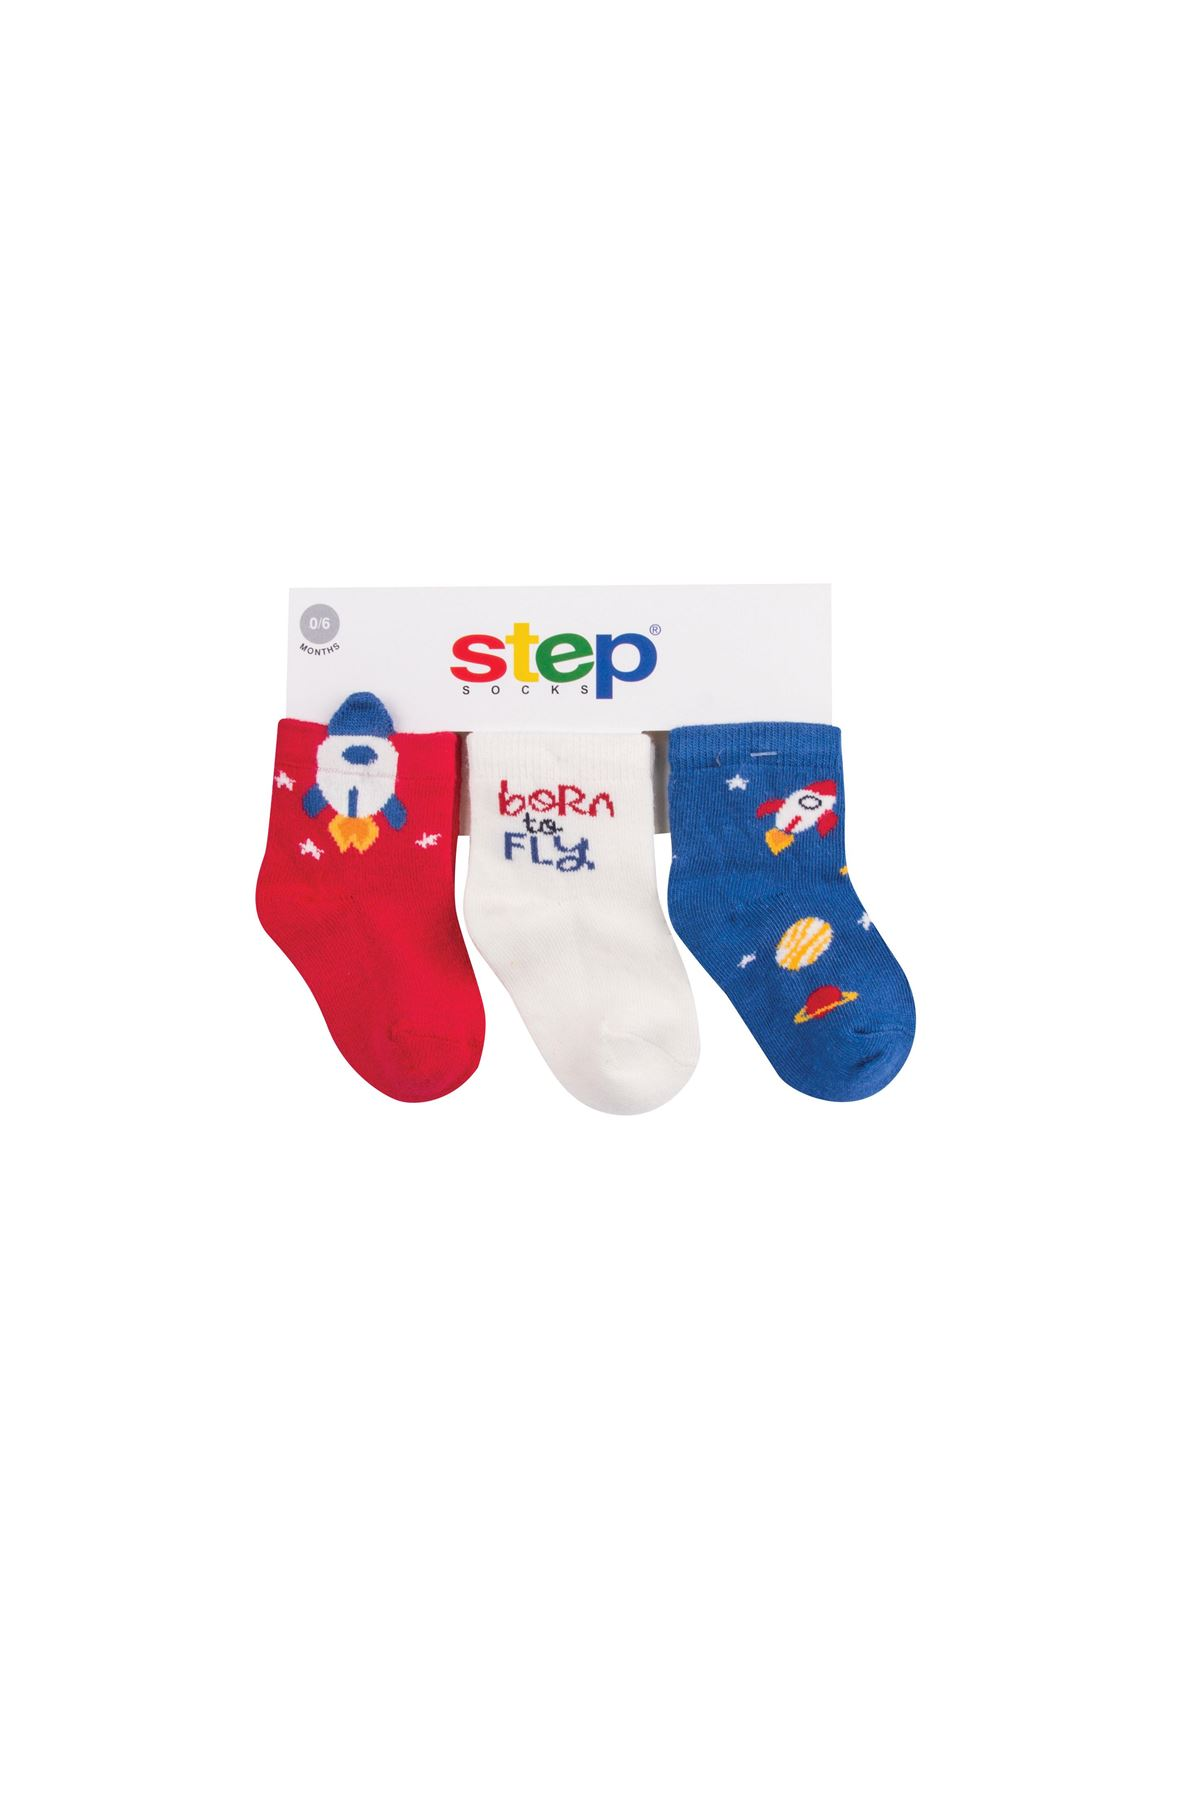 Step 3Lü 3D Uzay Soket Çorap 10151 Karışık Renkli